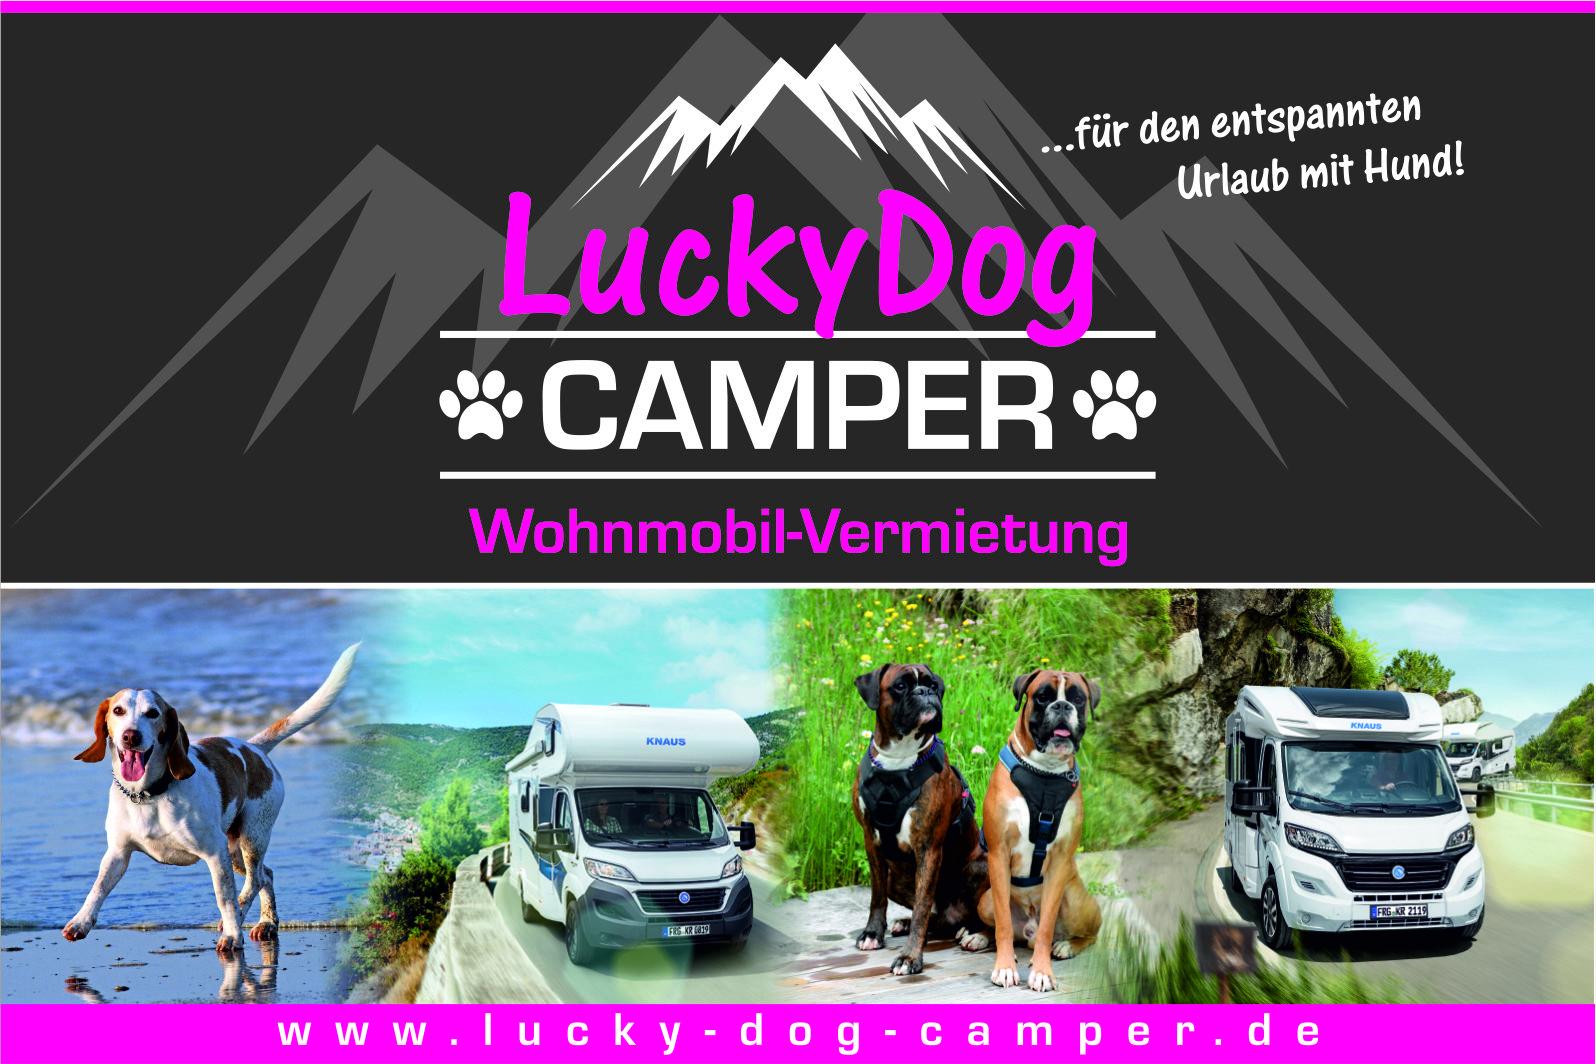 Lucky Dog Camper